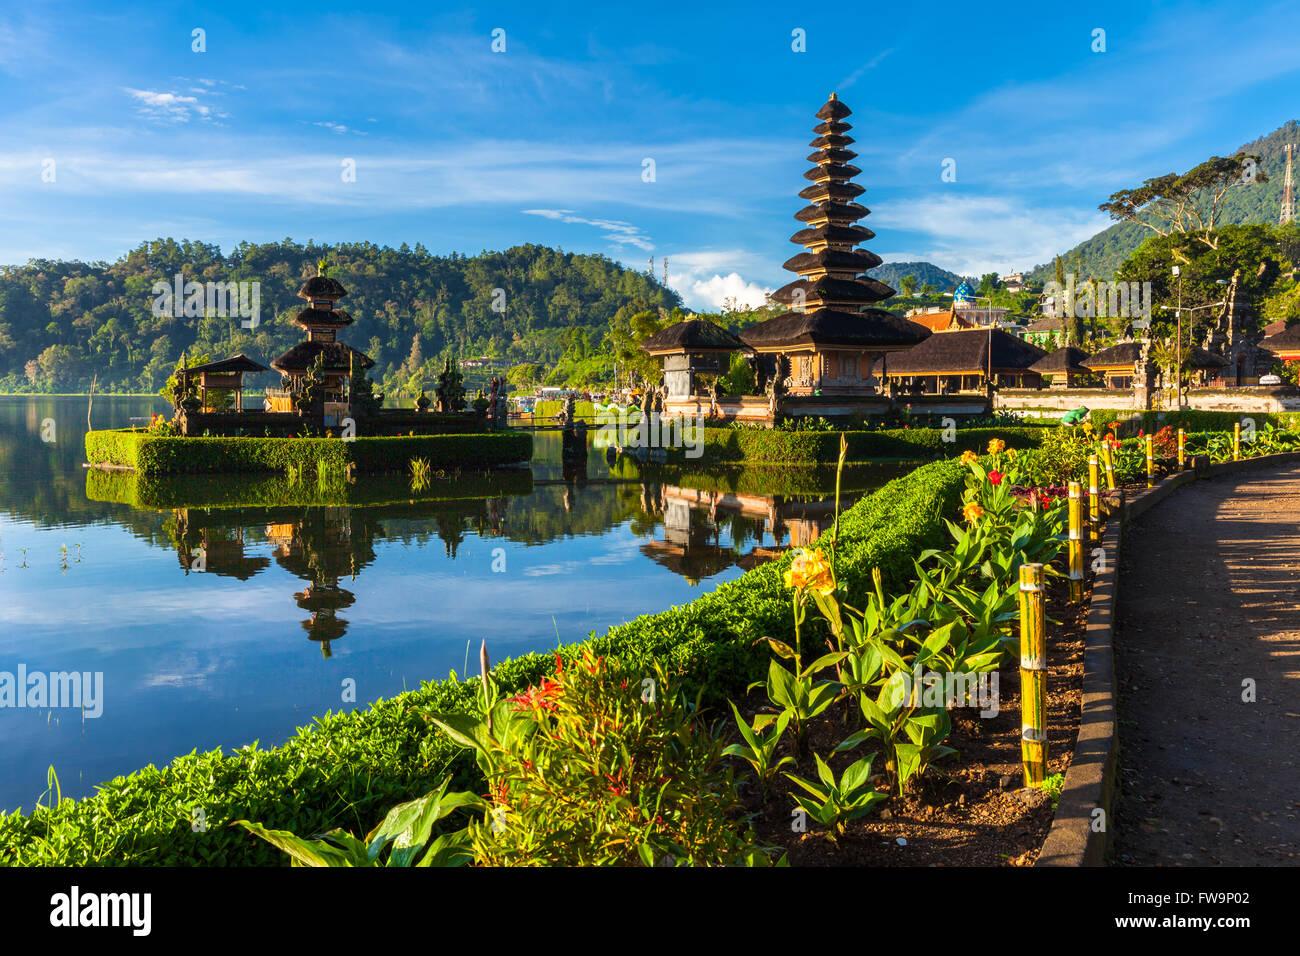 Pura Ulun Danu Bratan at sunrise, famous temple on the lake, Bedugul, Bali, Indonesia. - Stock Image